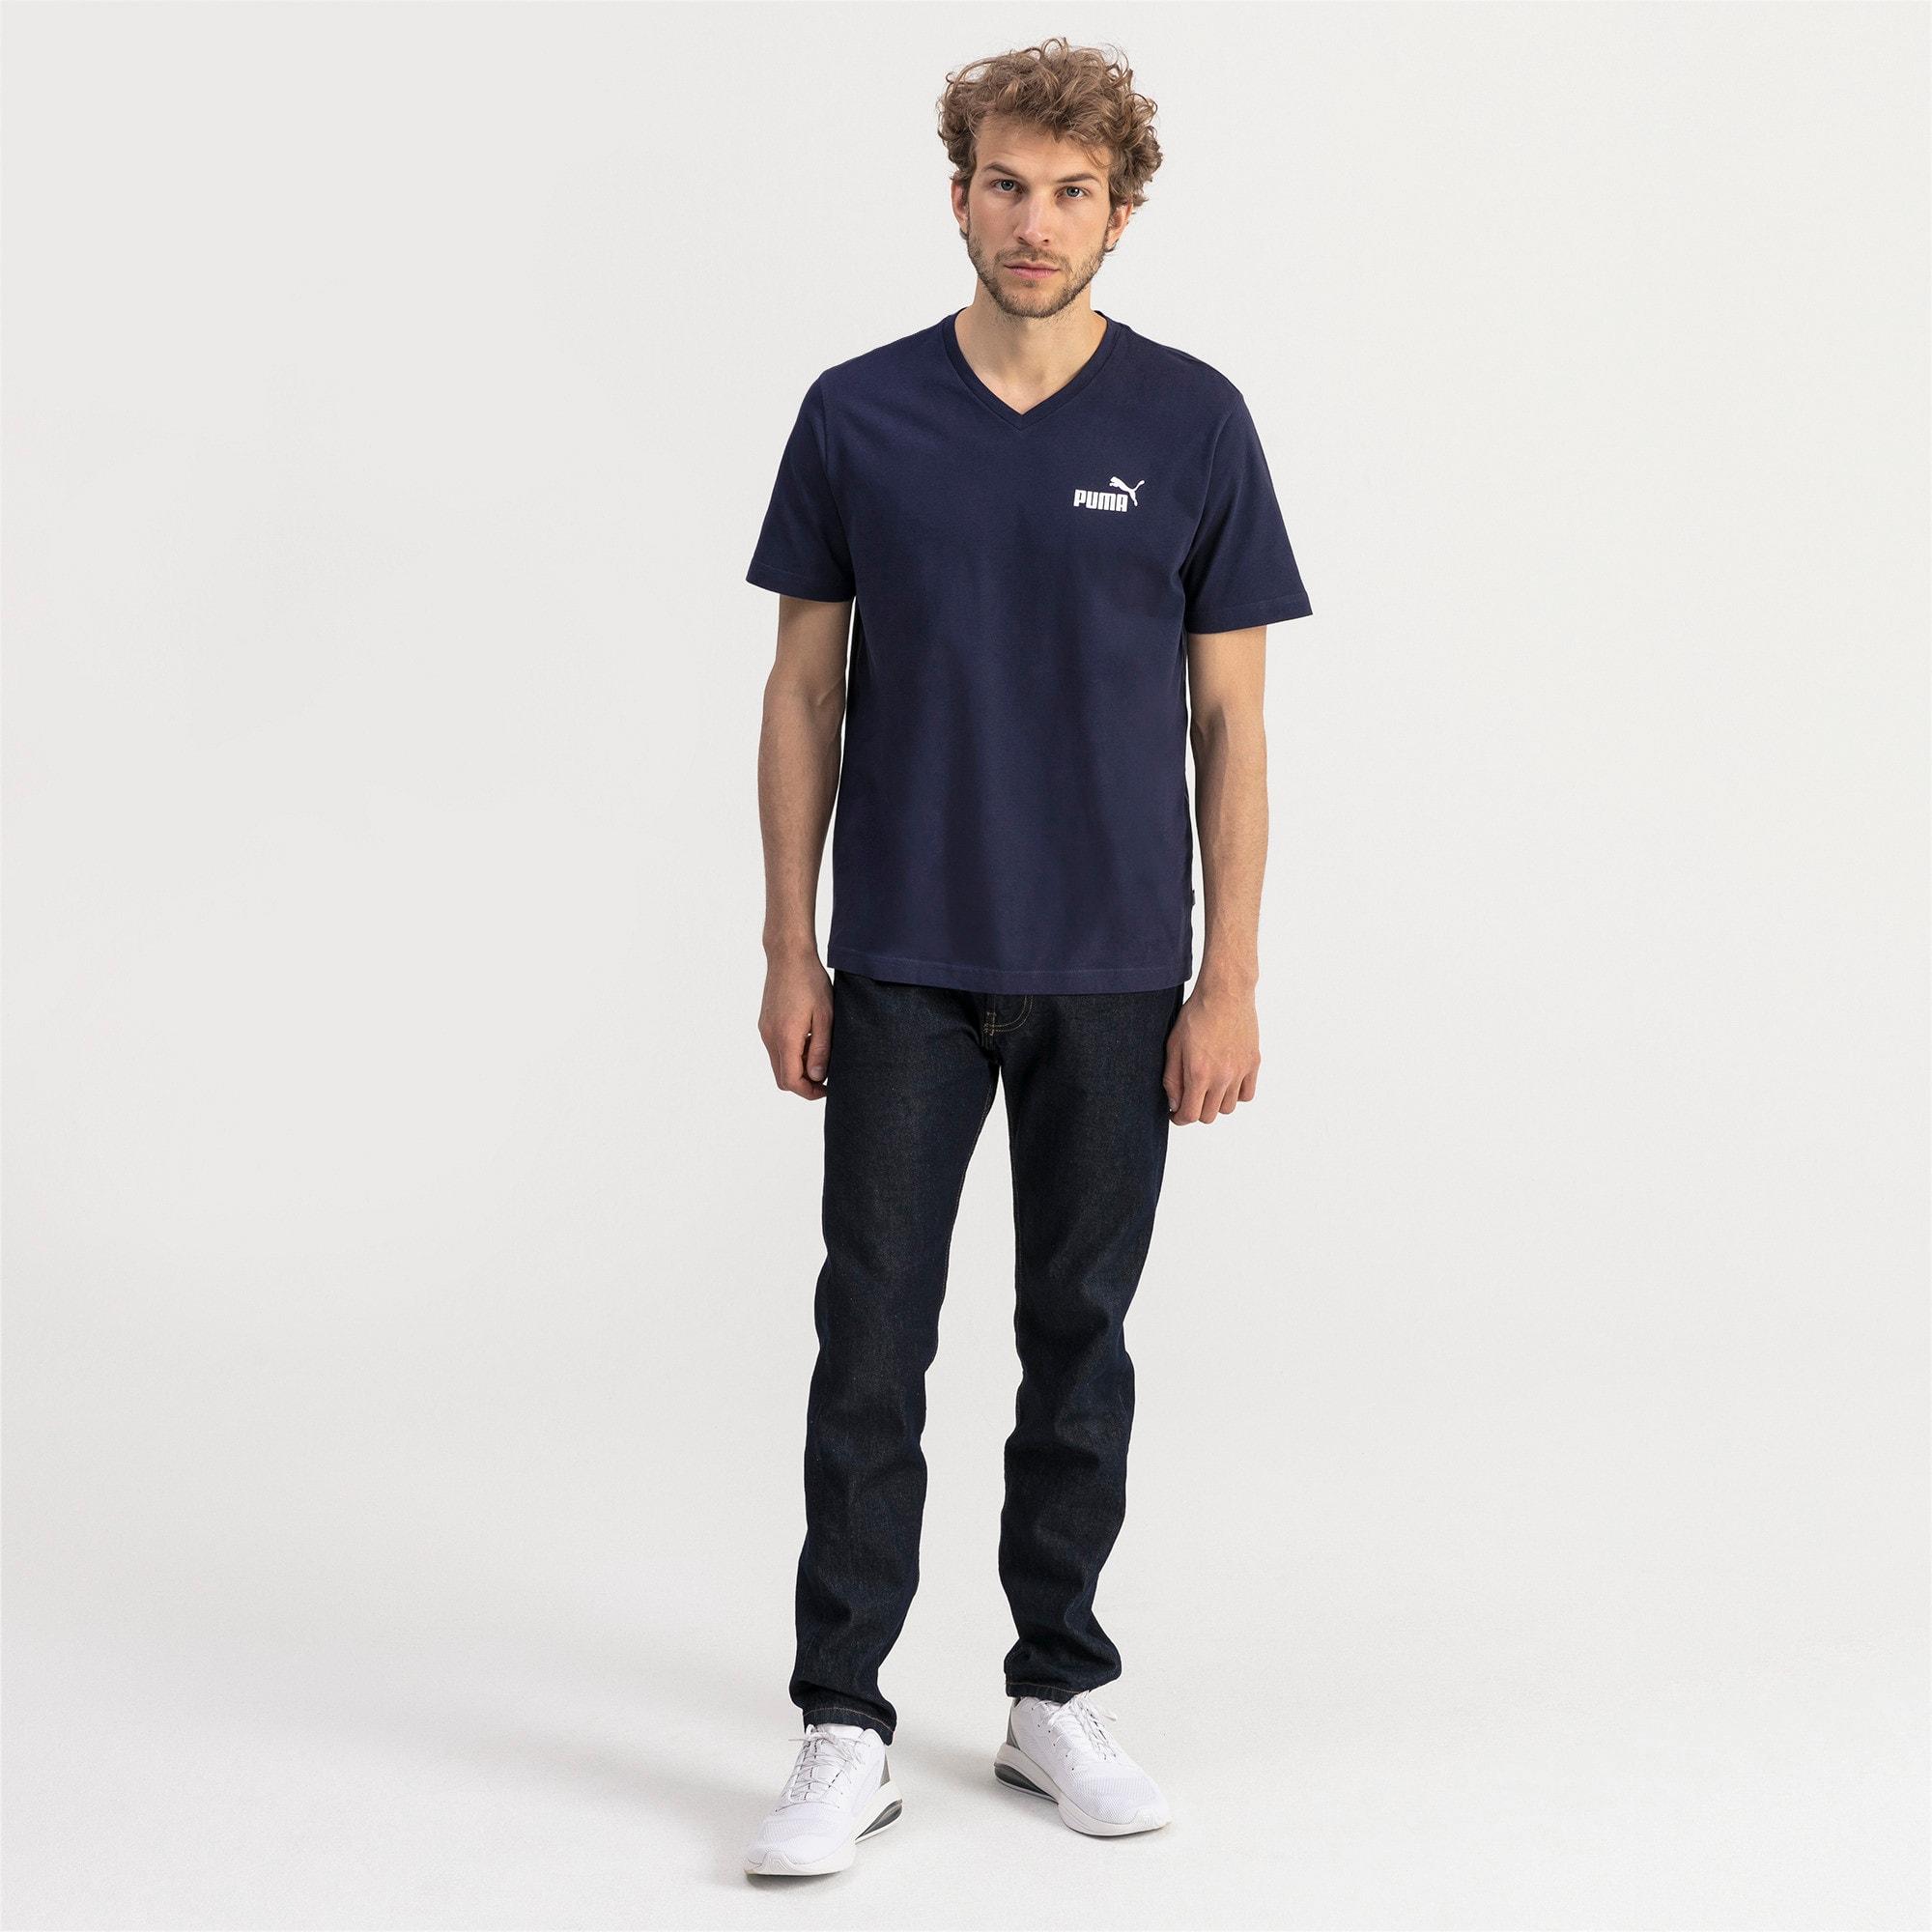 Thumbnail 3 of T-shirt con scollo a V Essentials uomo, Peacoat, medium